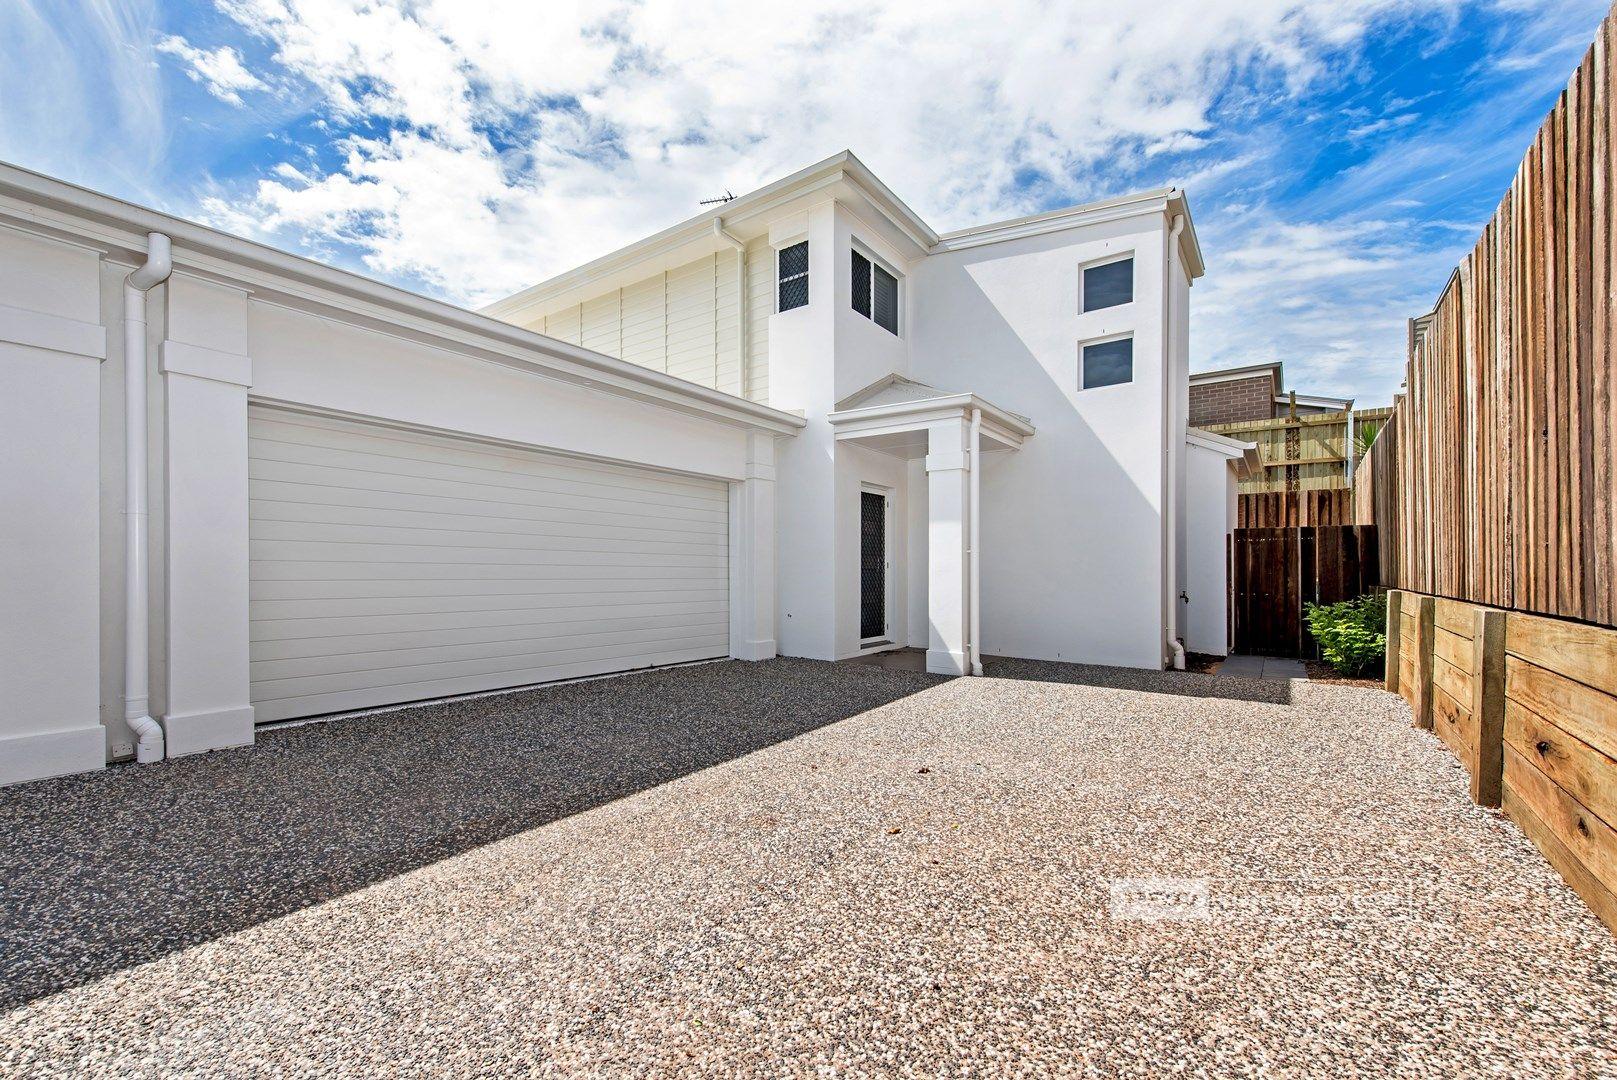 3/10 Burke Street, Rangeville QLD 4350, Image 0